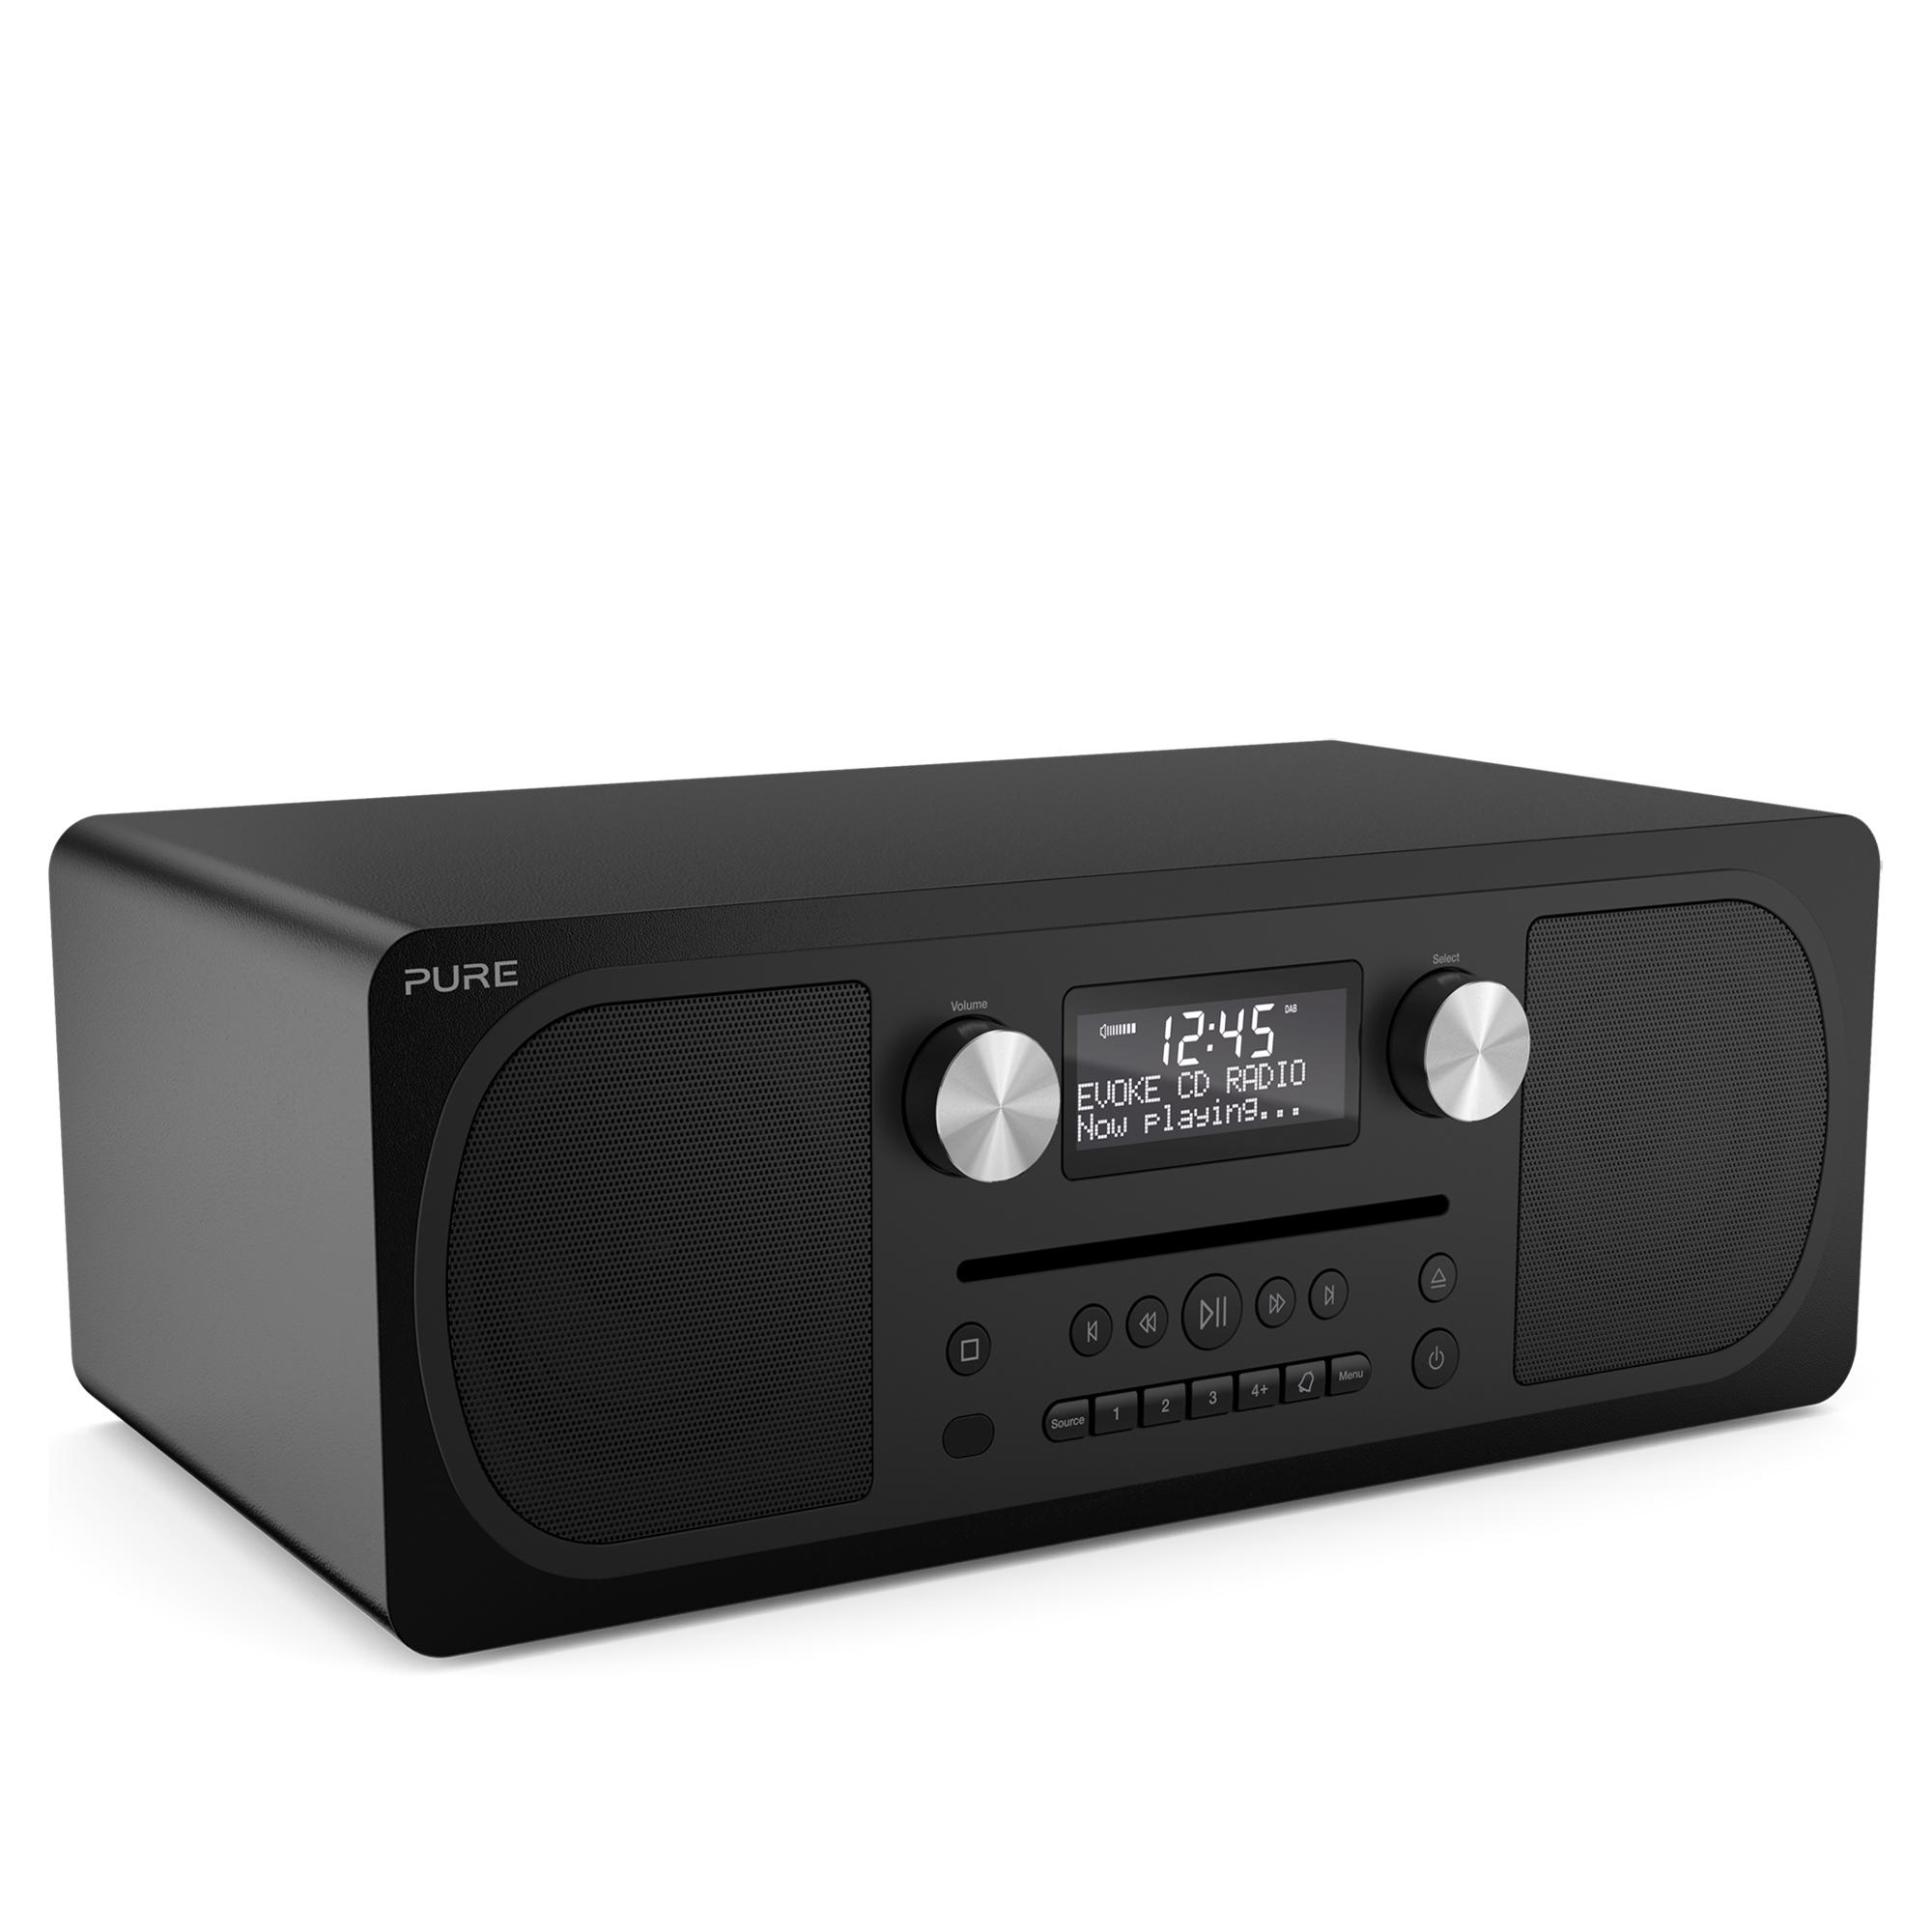 Pure Evoke C D6 Dab Bluetooth Radio With Cd Player Hughes